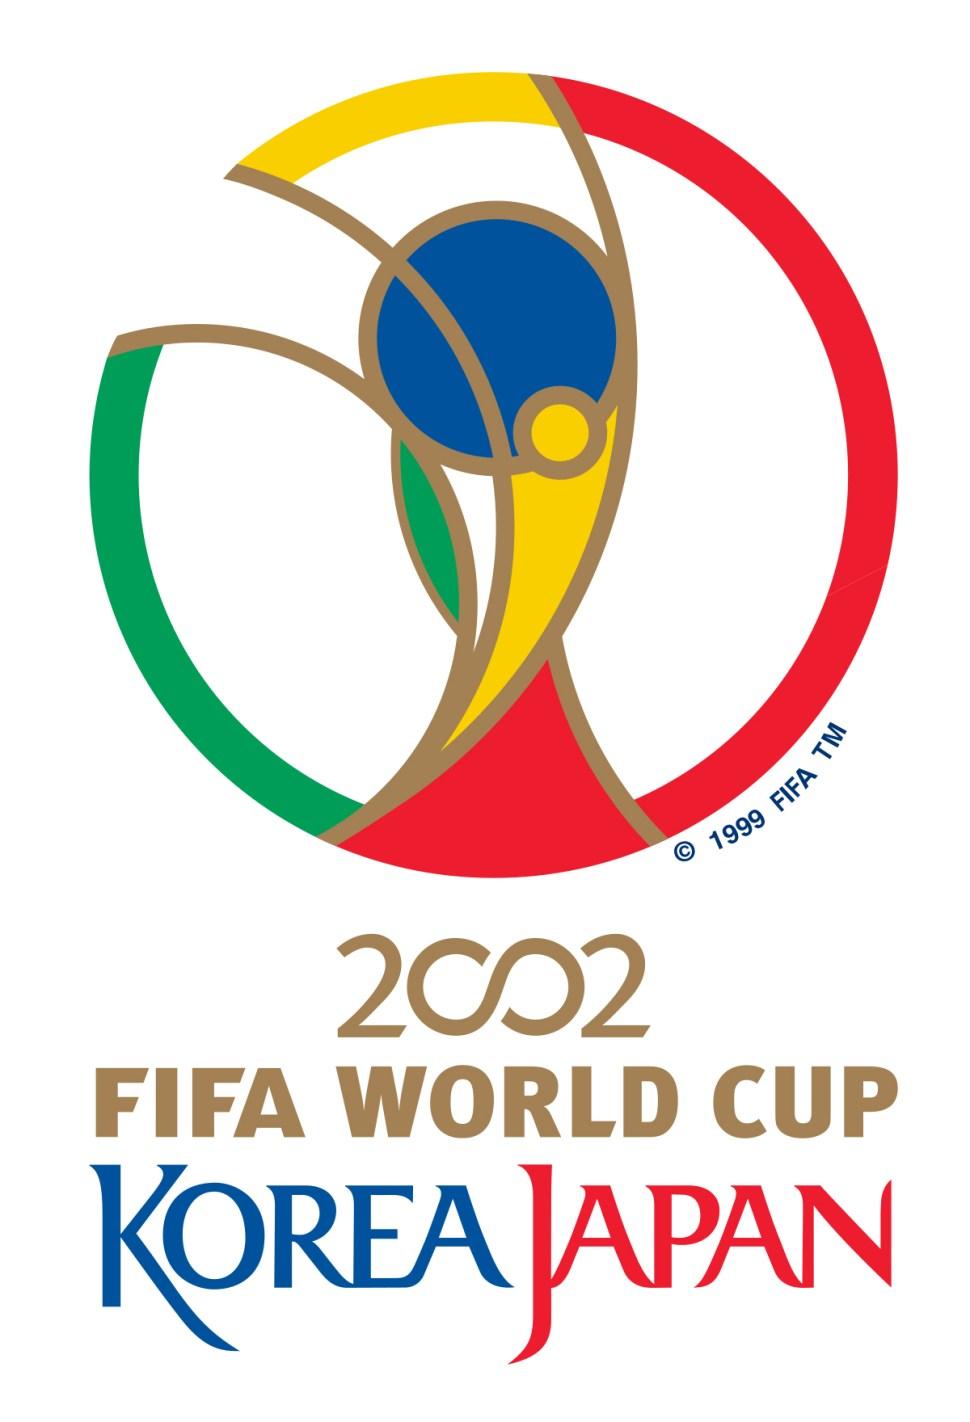 Korea / Japan 2002 world cup logo